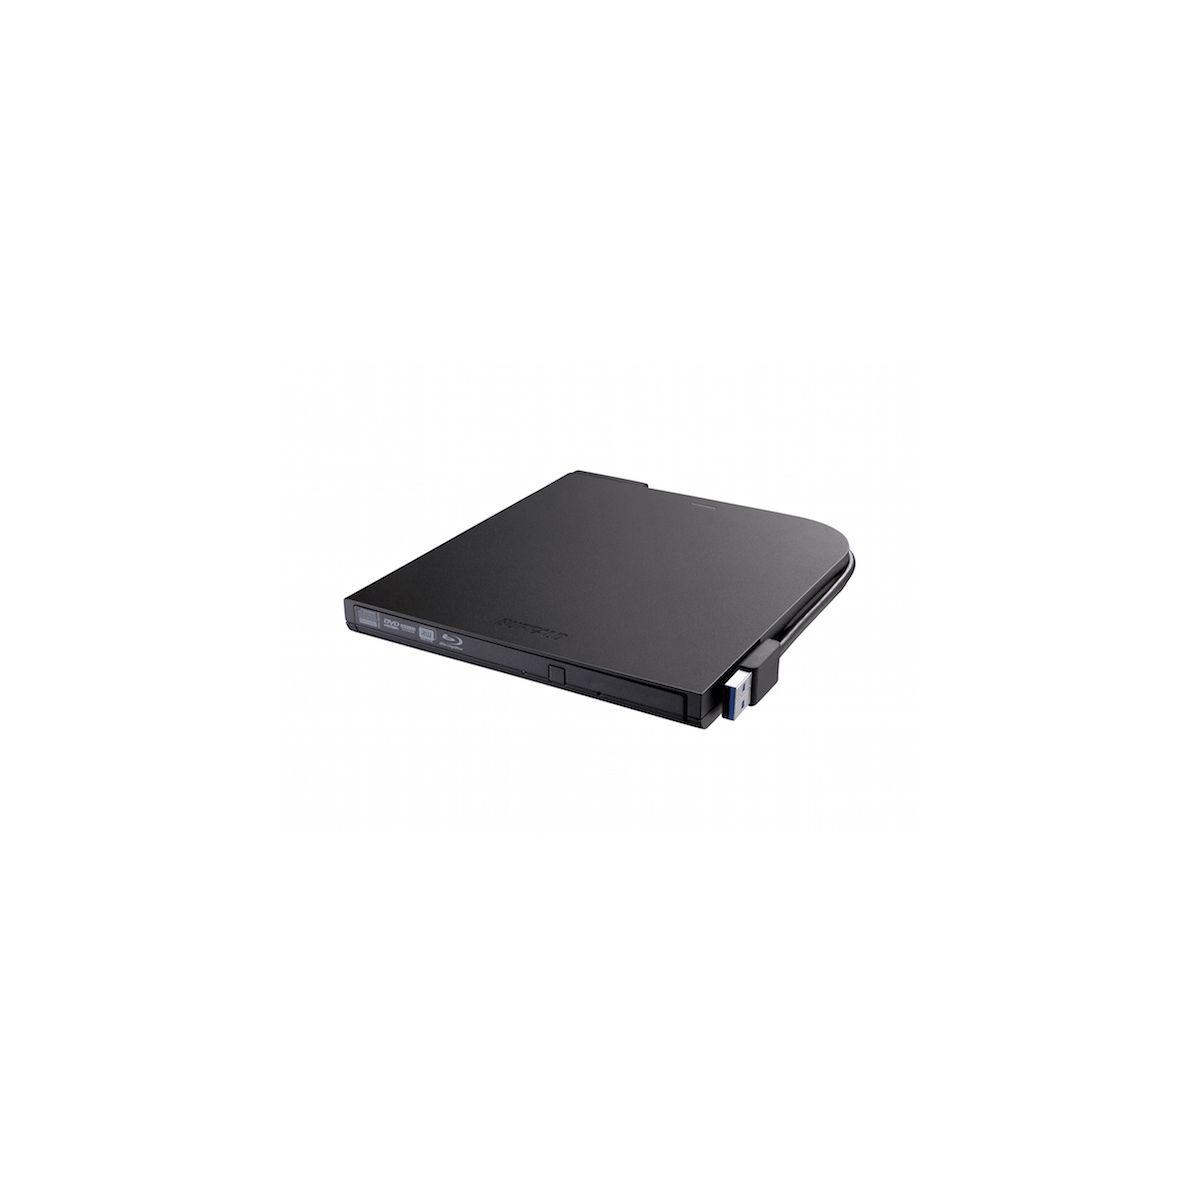 Graveur DVD Externe BUFFALO MediaStation Blue Ray Portable ultraslim (photo)